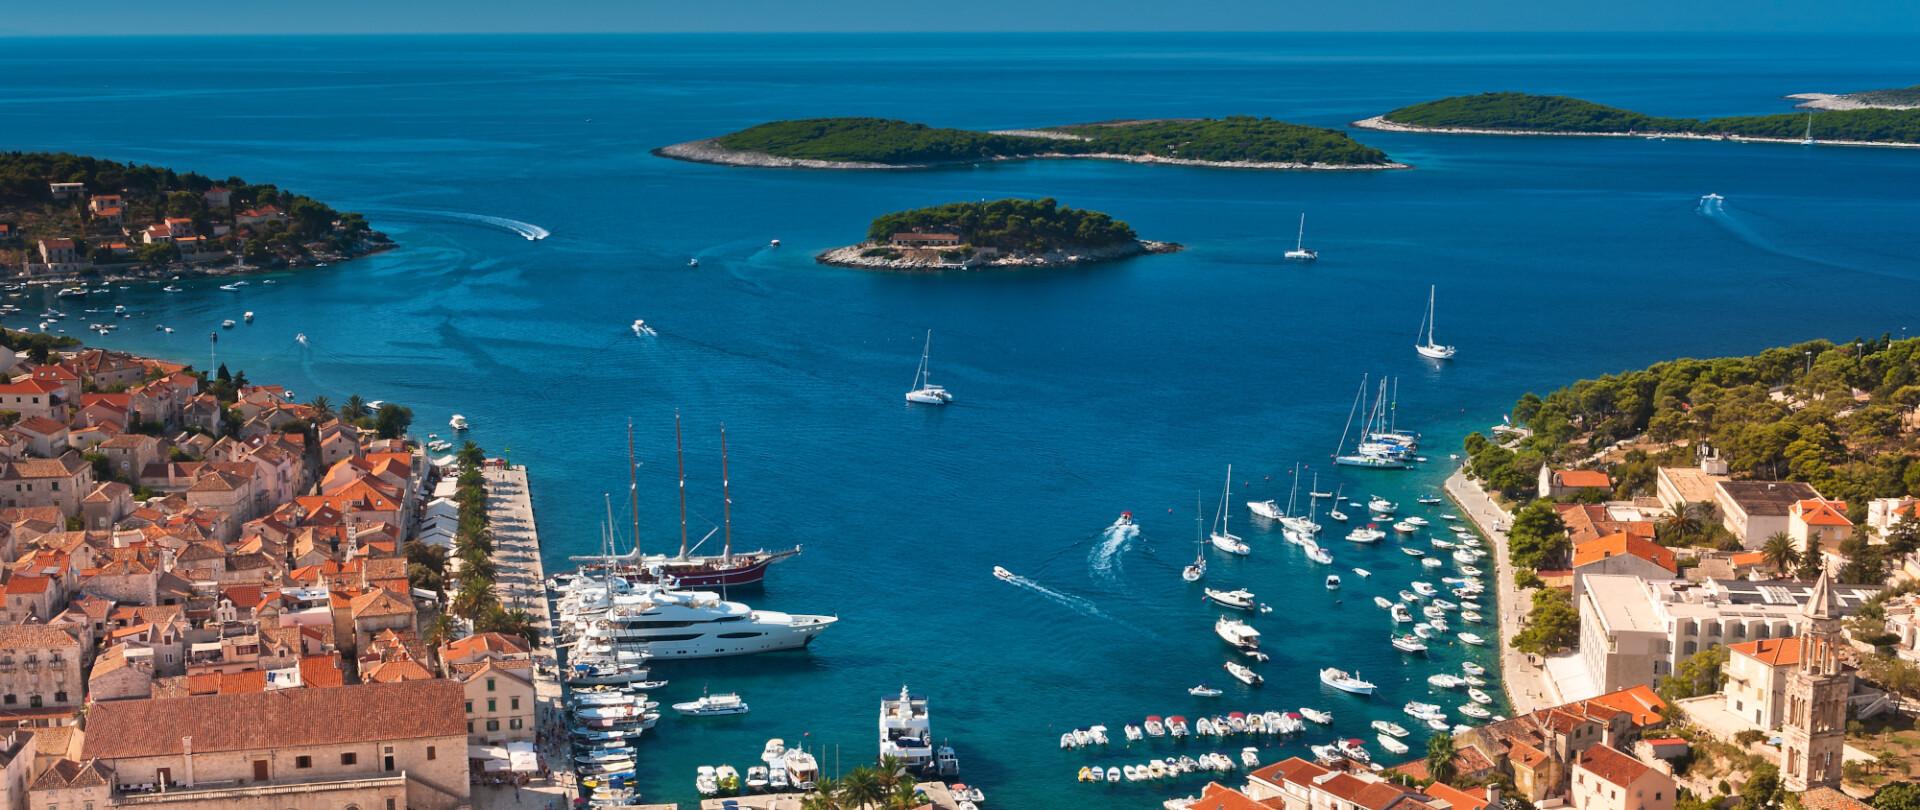 Discover Croatia on a superyacht charter photo 1